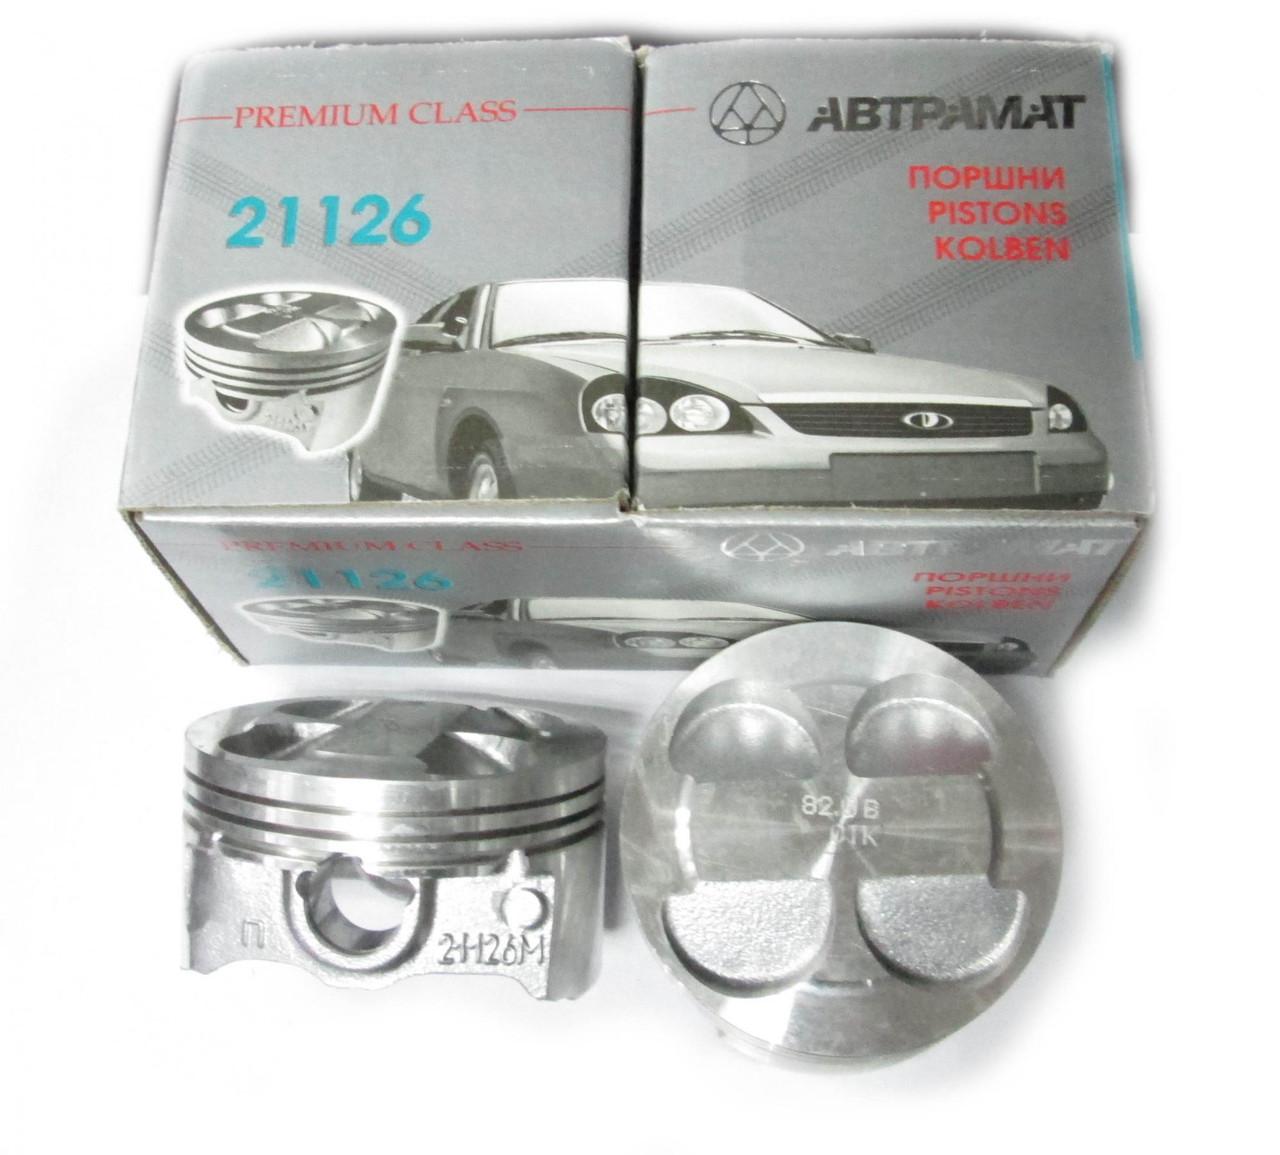 Поршни ВАЗ 2170 21126 Автрамат 82,5 Е комплект